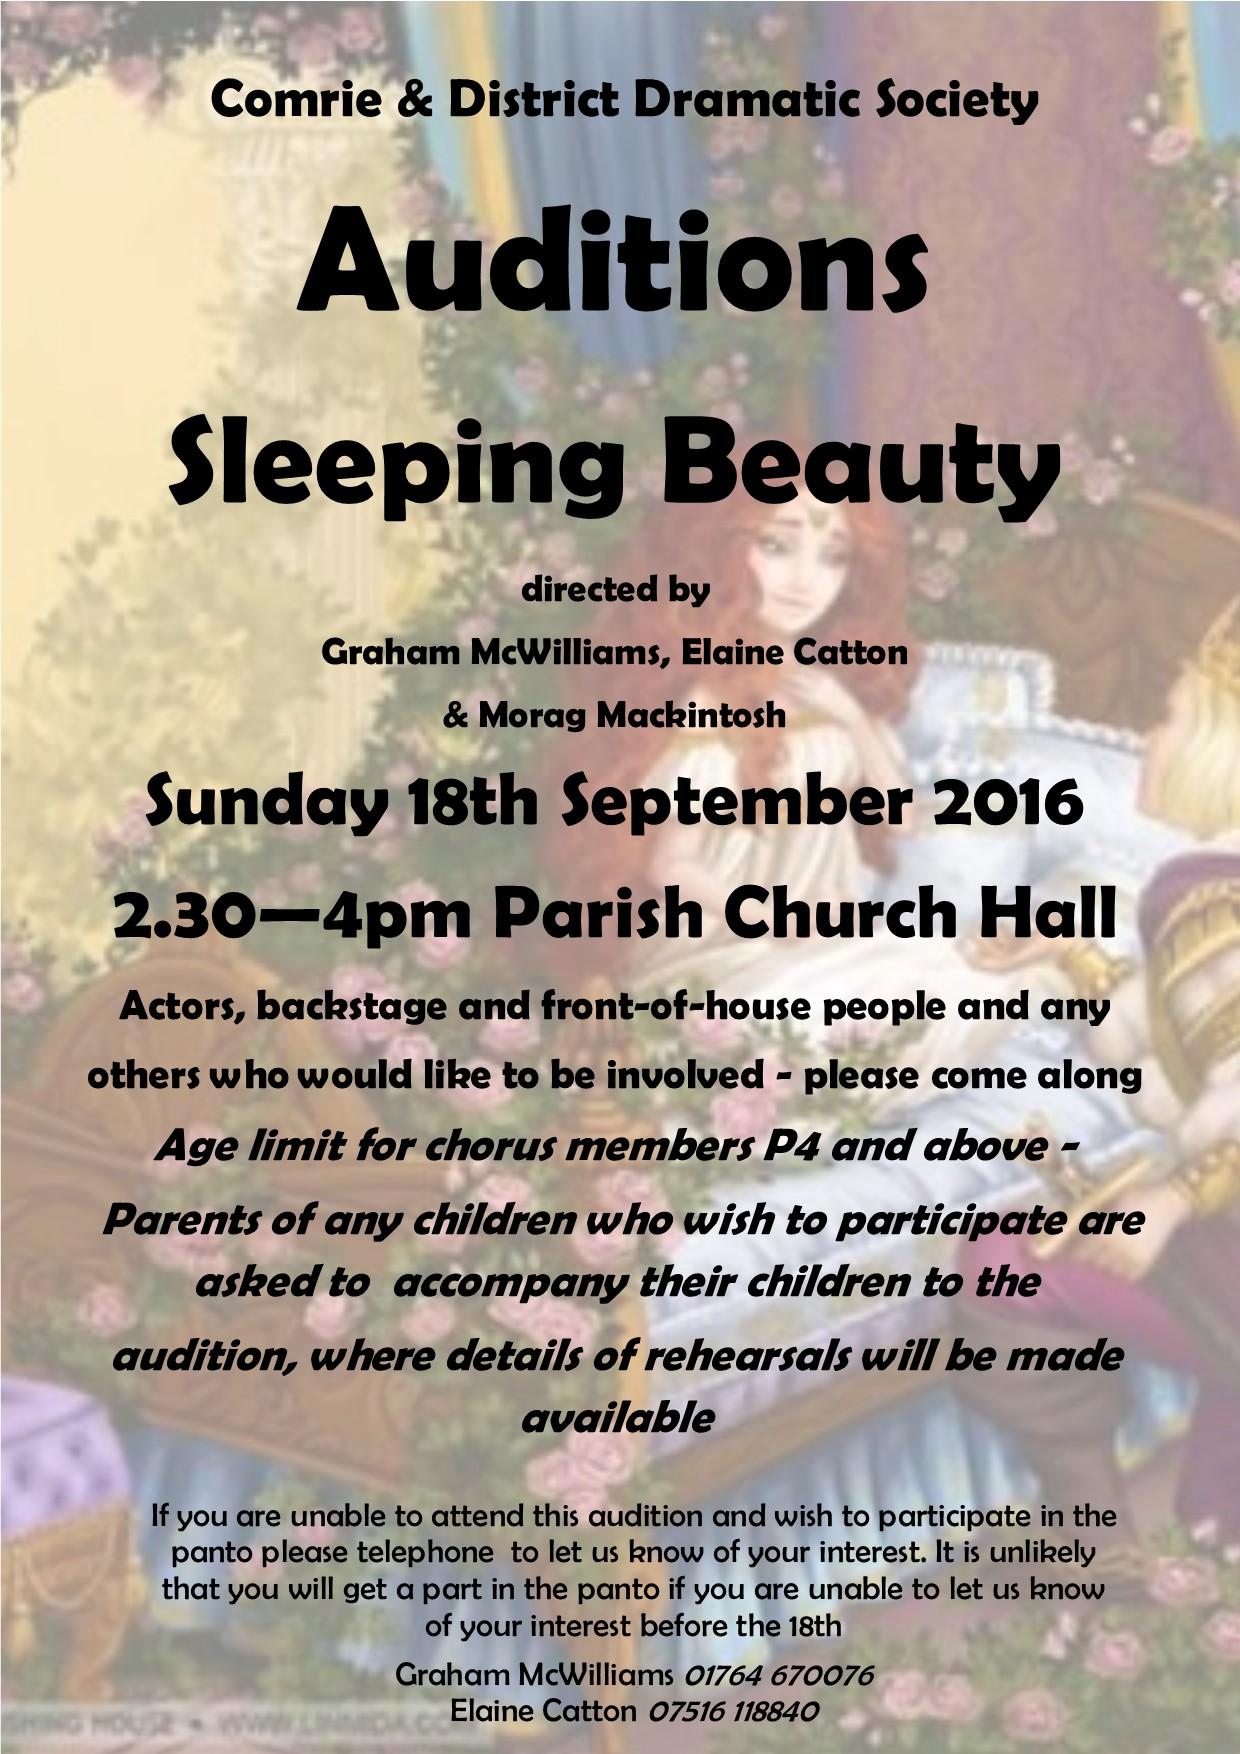 sleeping-beauty-audition-flyer